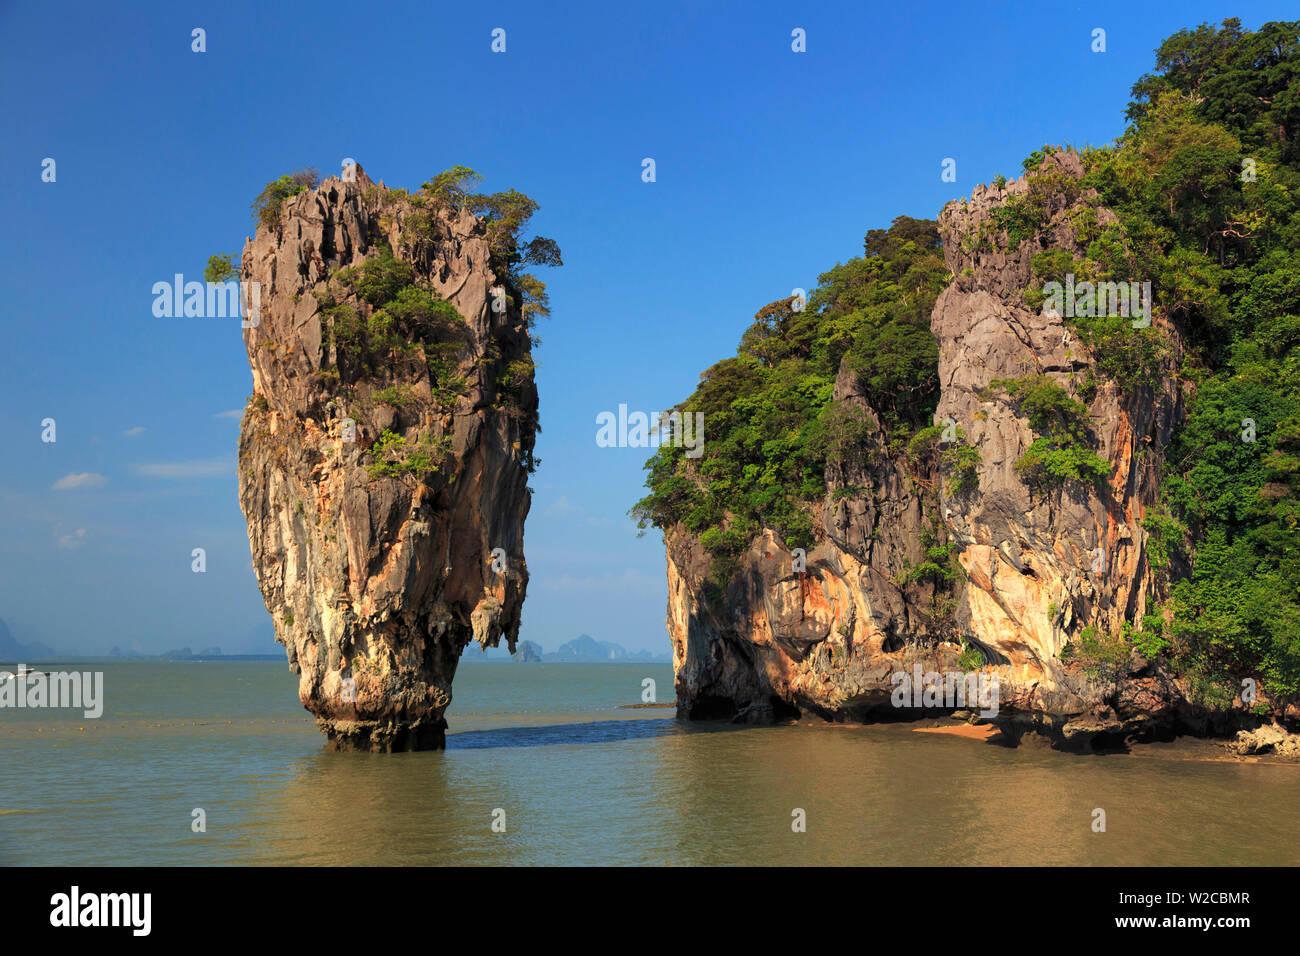 Tailandia, la provincia de Krabi, Ao Phang-Nga (Bahía Phang-Nga), la isla de James Bond (Ko Khao Phing Kan) Foto de stock